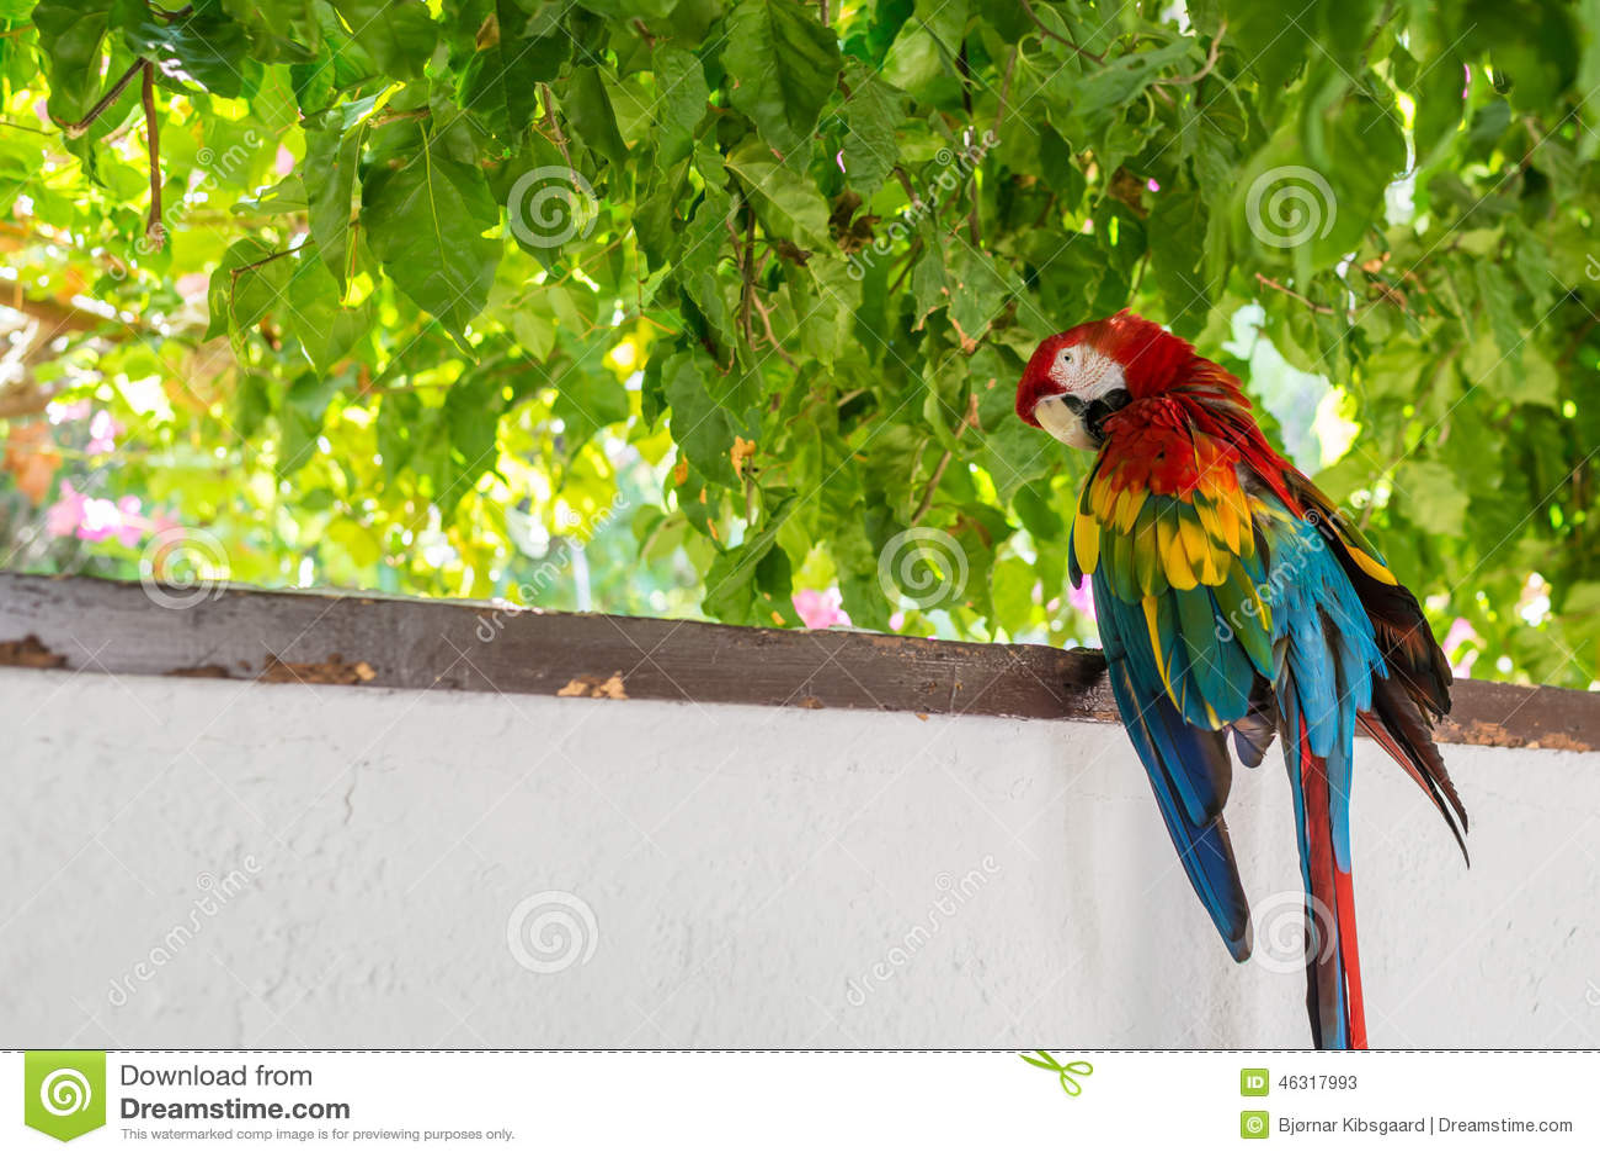 perroquet rouge d 39 ara de vert bleu photo stock image 46317993. Black Bedroom Furniture Sets. Home Design Ideas